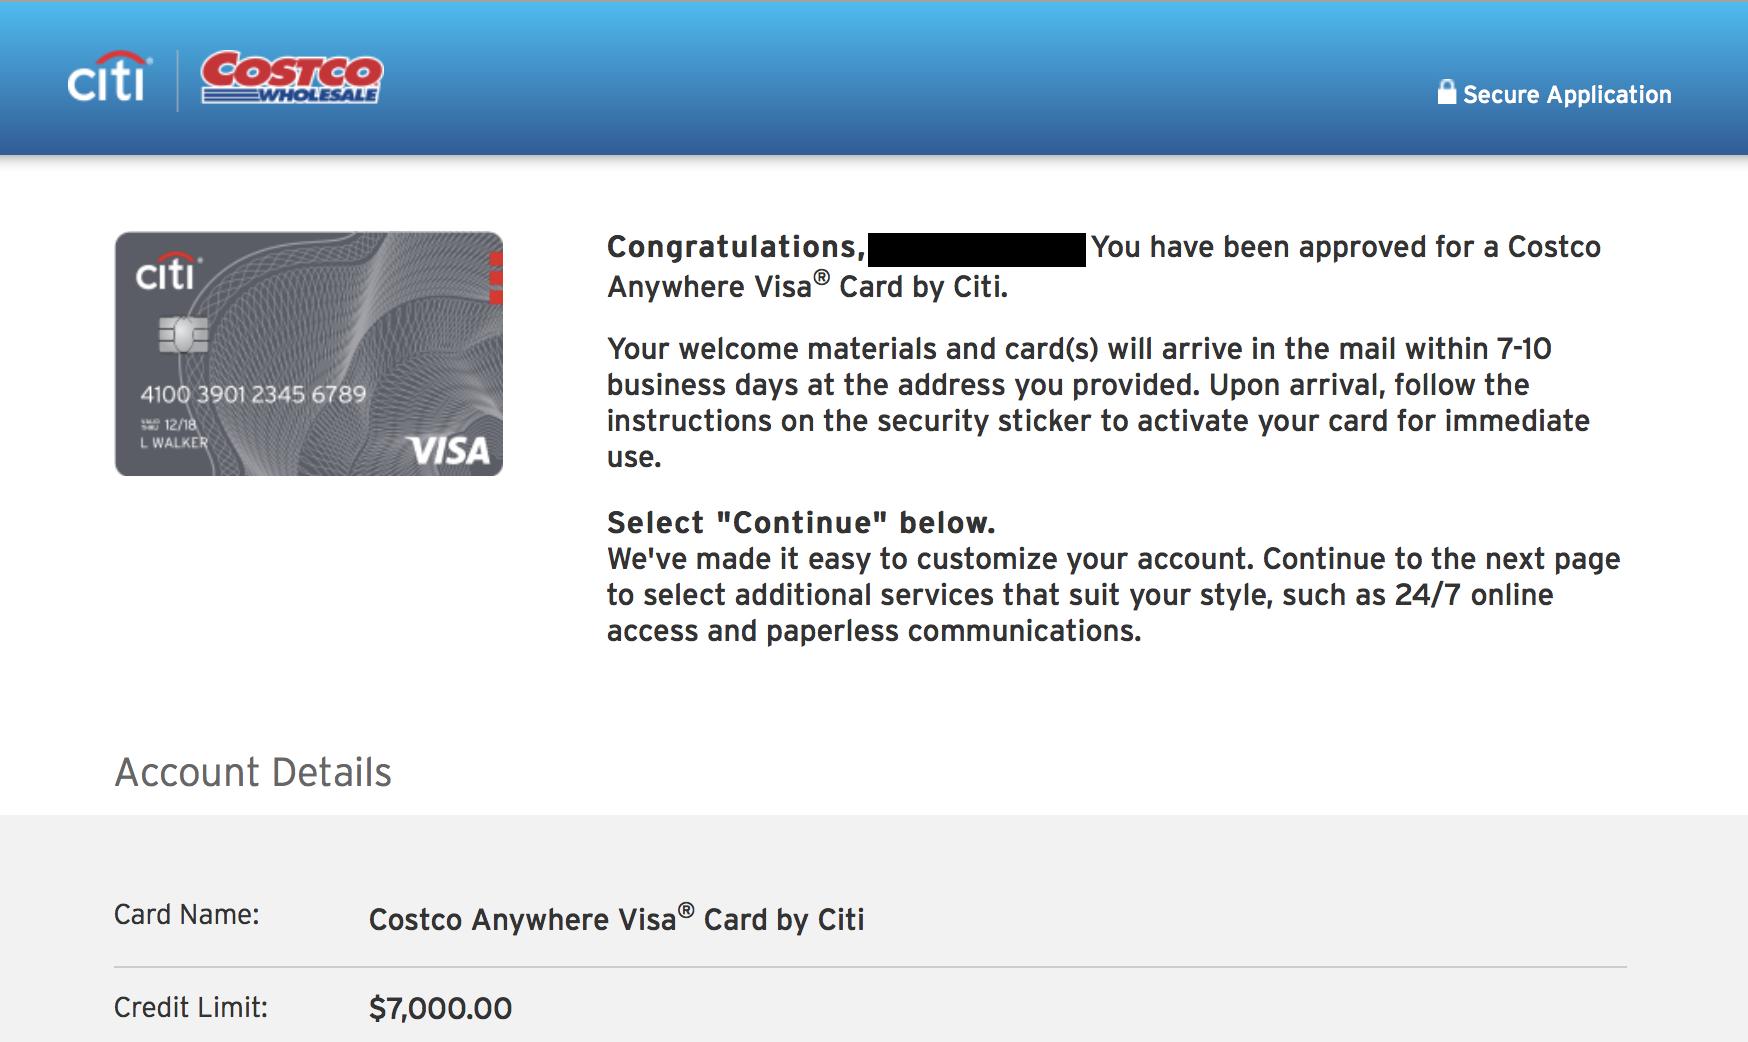 Citi Costco Visa Card Account Login